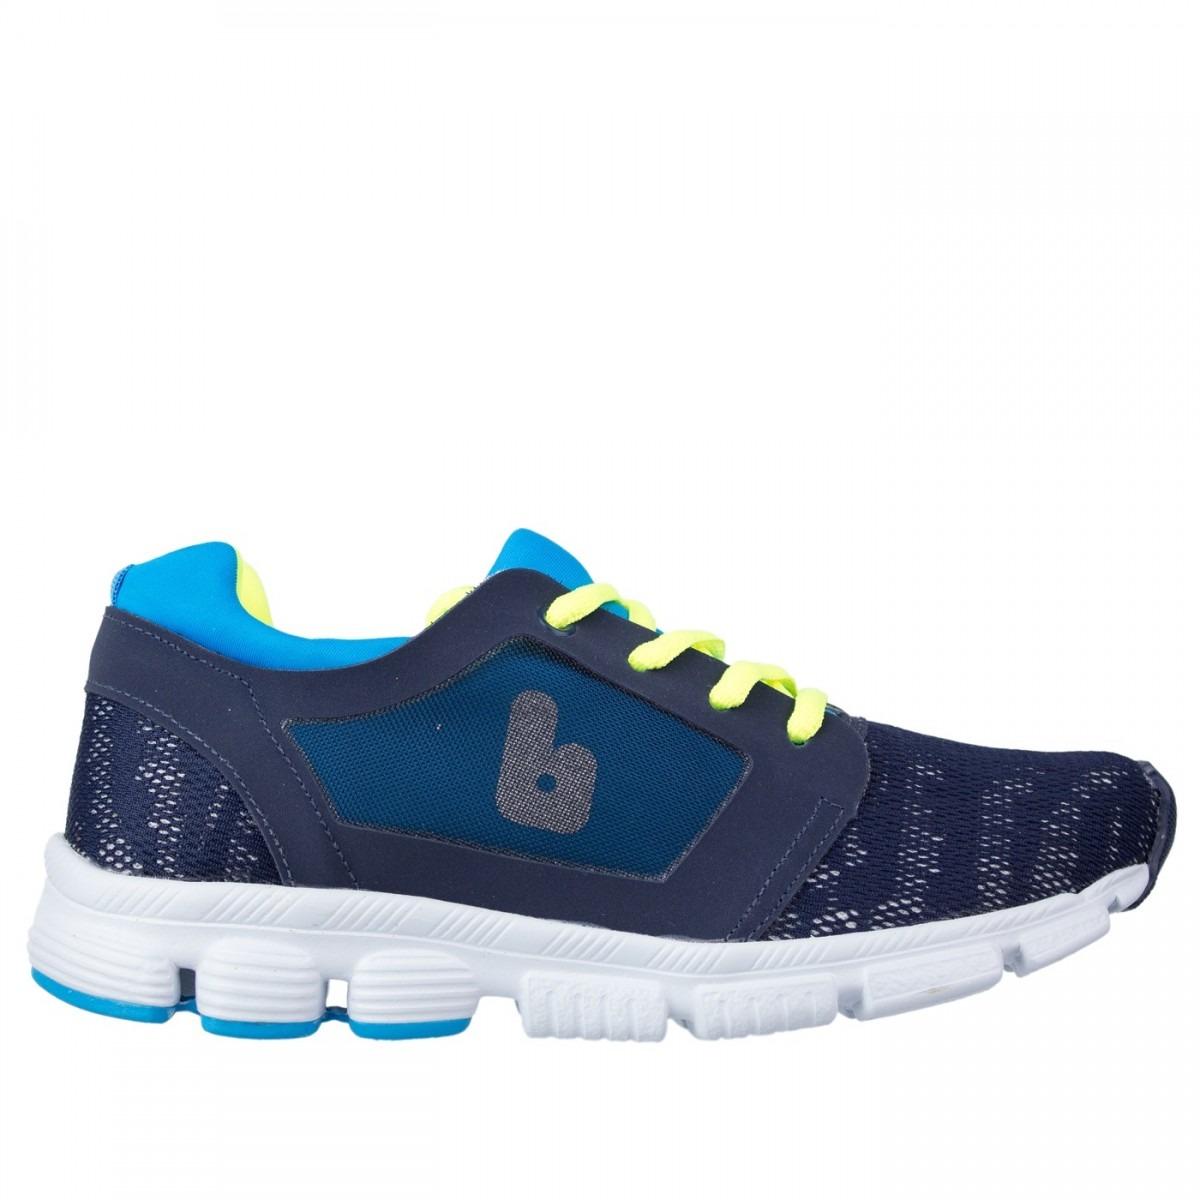 fdb83b27201 tênis infantil masculino bibi icon azul esportivo original. Carregando zoom.